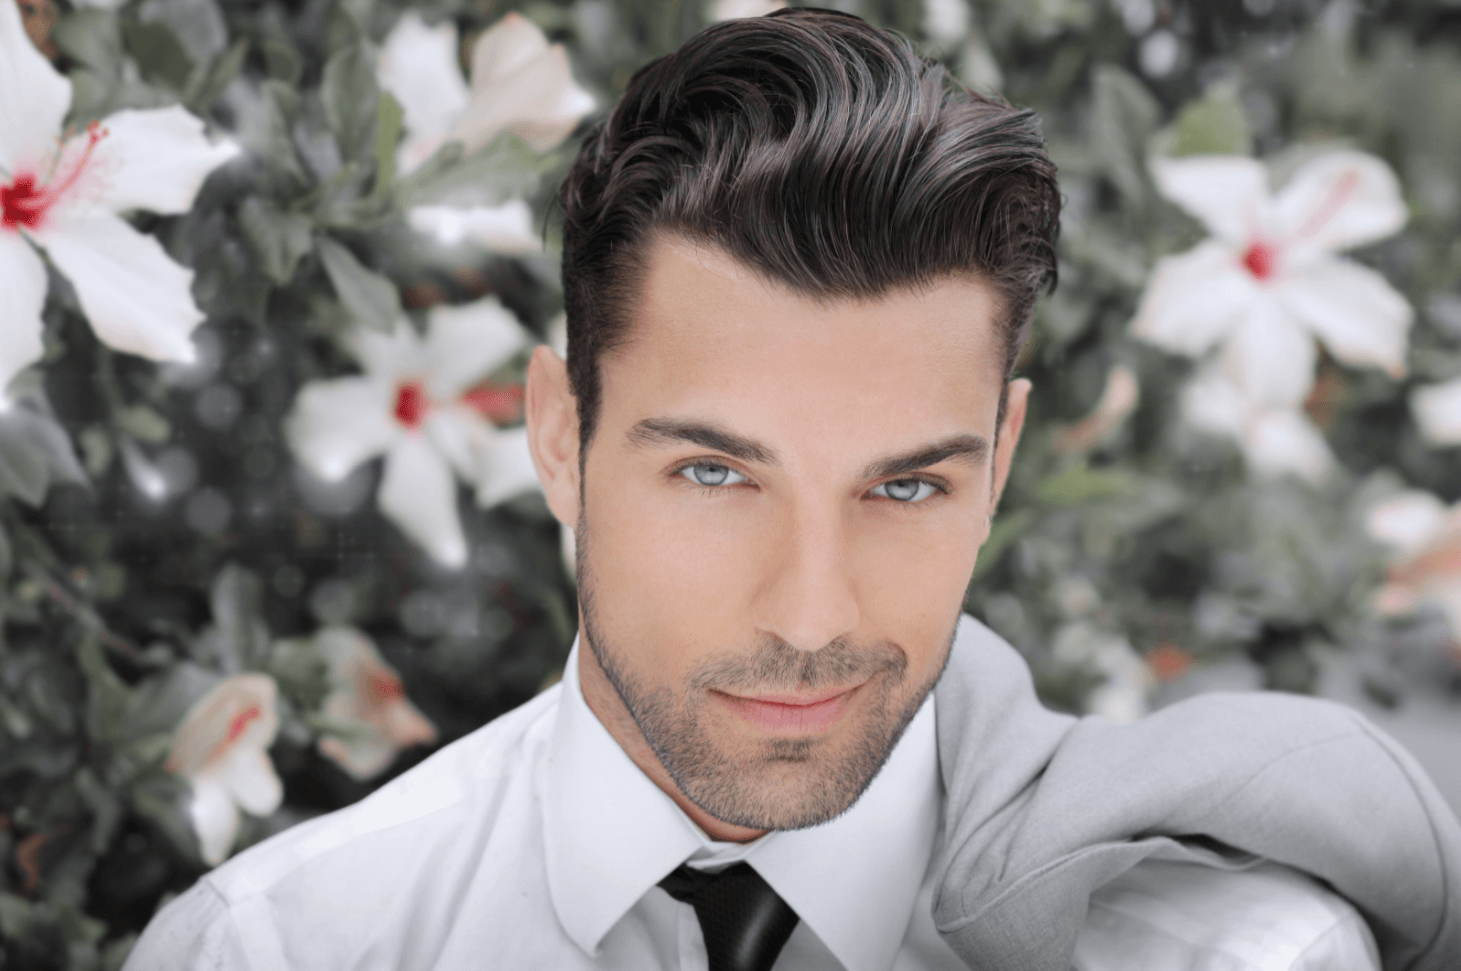 Männerfrisuren: Gel, Pomade, Paste oder Wachs? | PerfectHair.ch